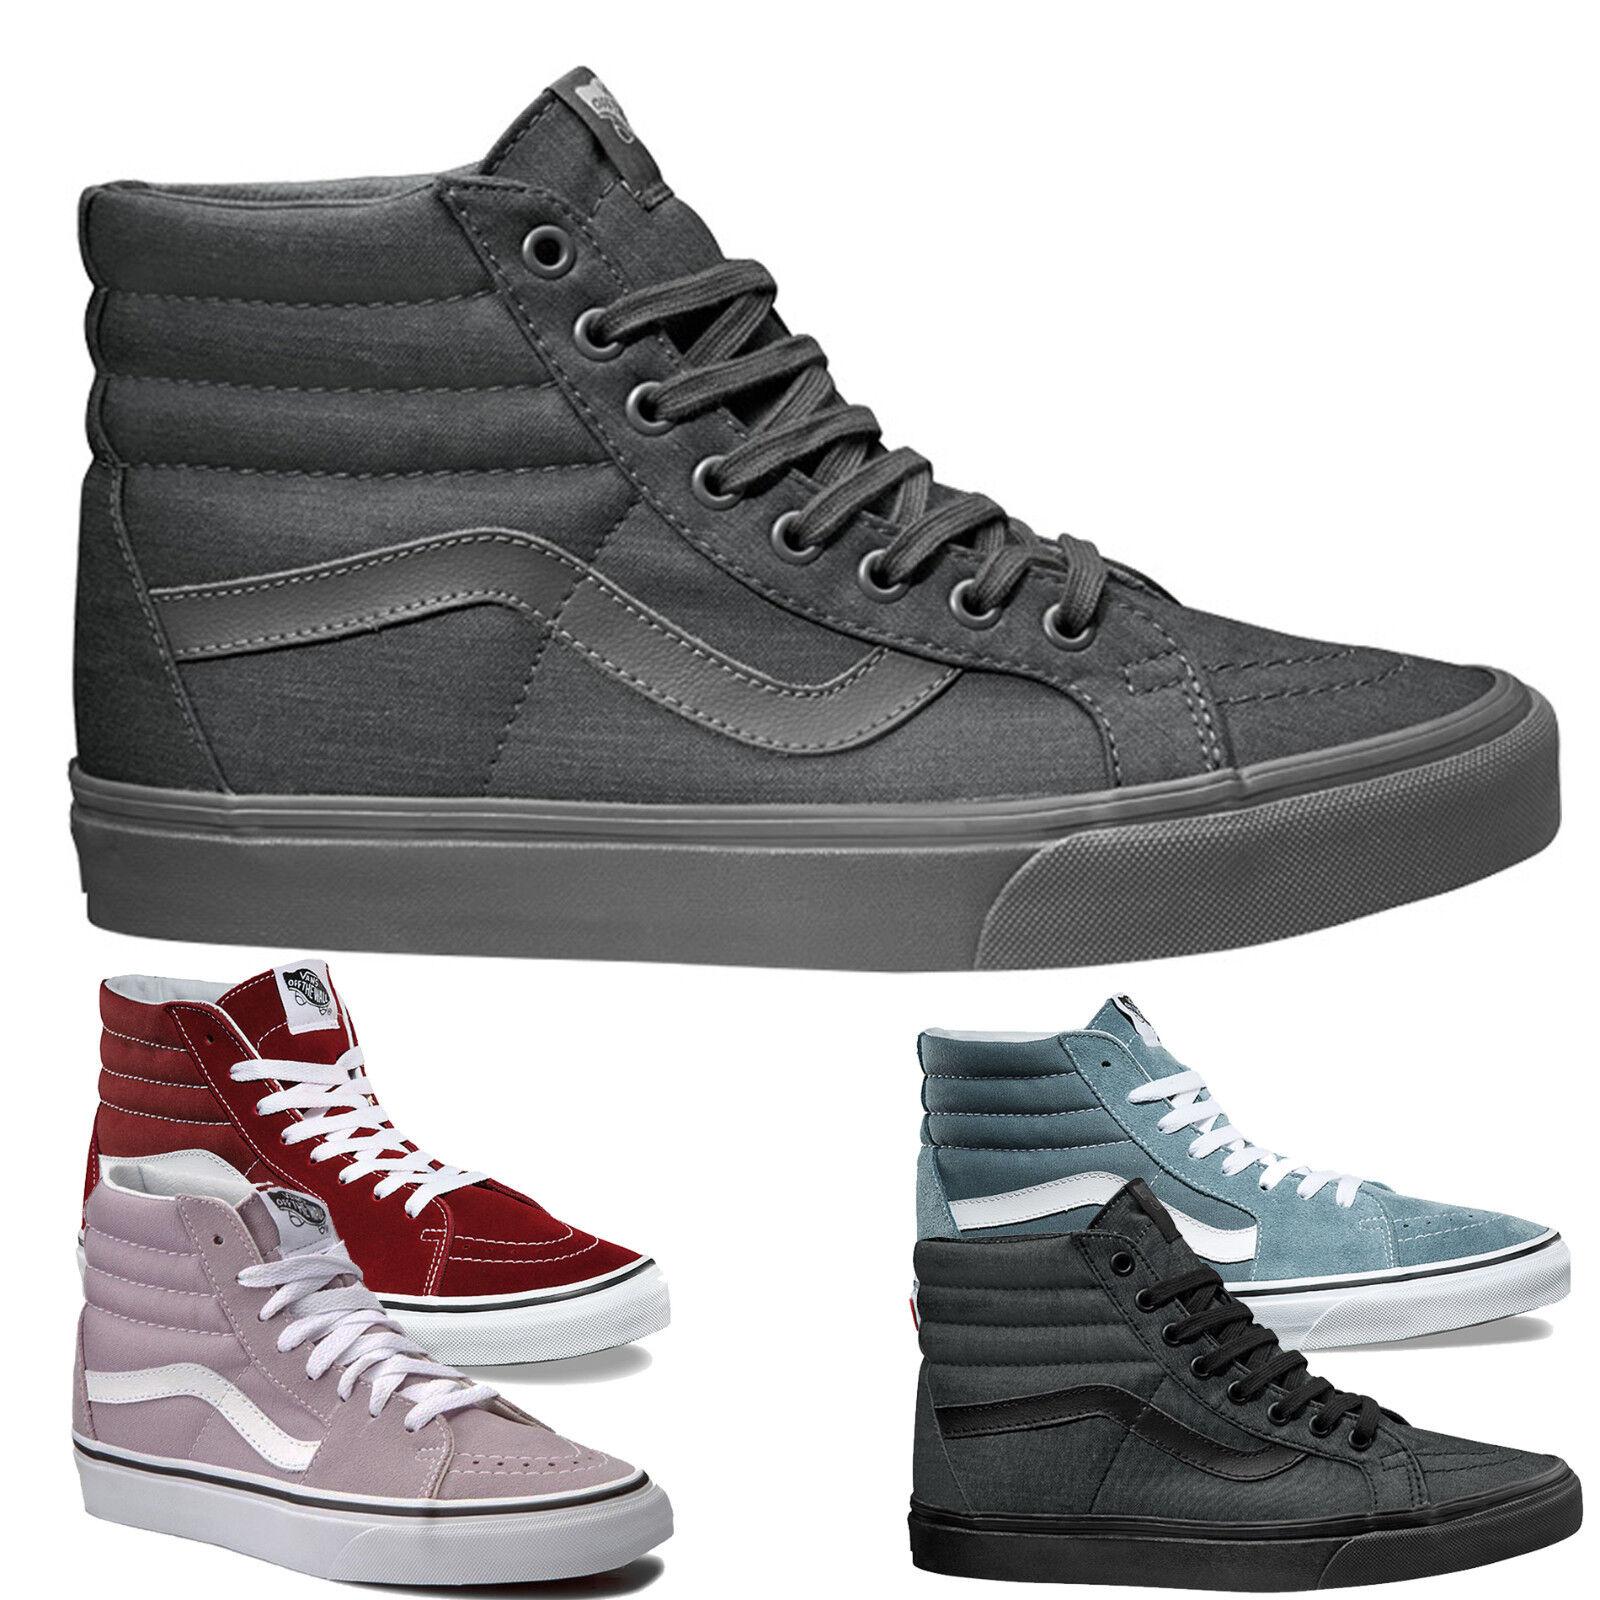 Vans - SK8-HI Skate Vans Hi-Top Sneaker Mehrere Farben NEU und Original